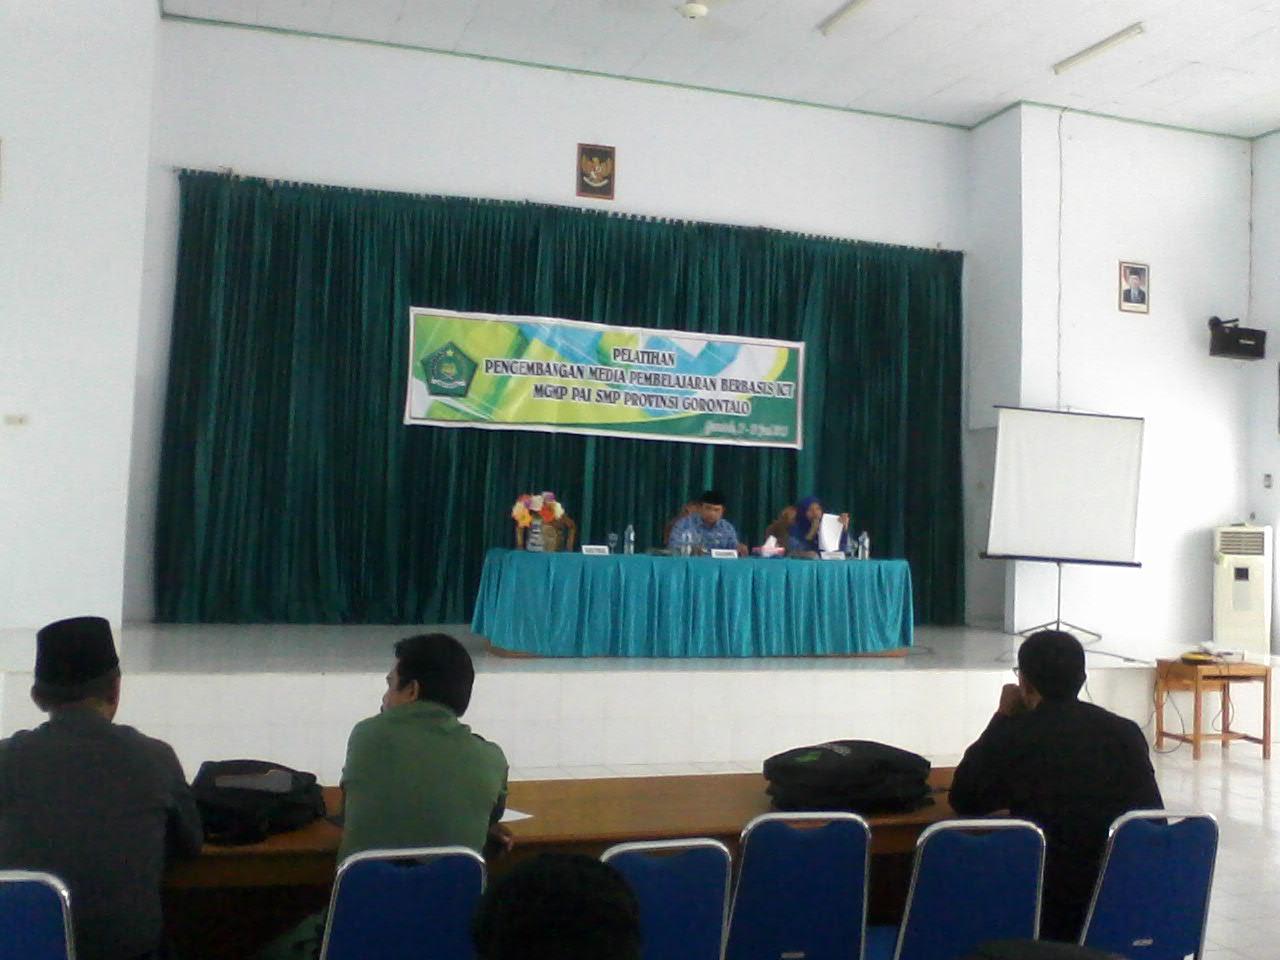 rpp berkarakter bahasa indonesia smk kelas xii rpp berkarakter bahasa